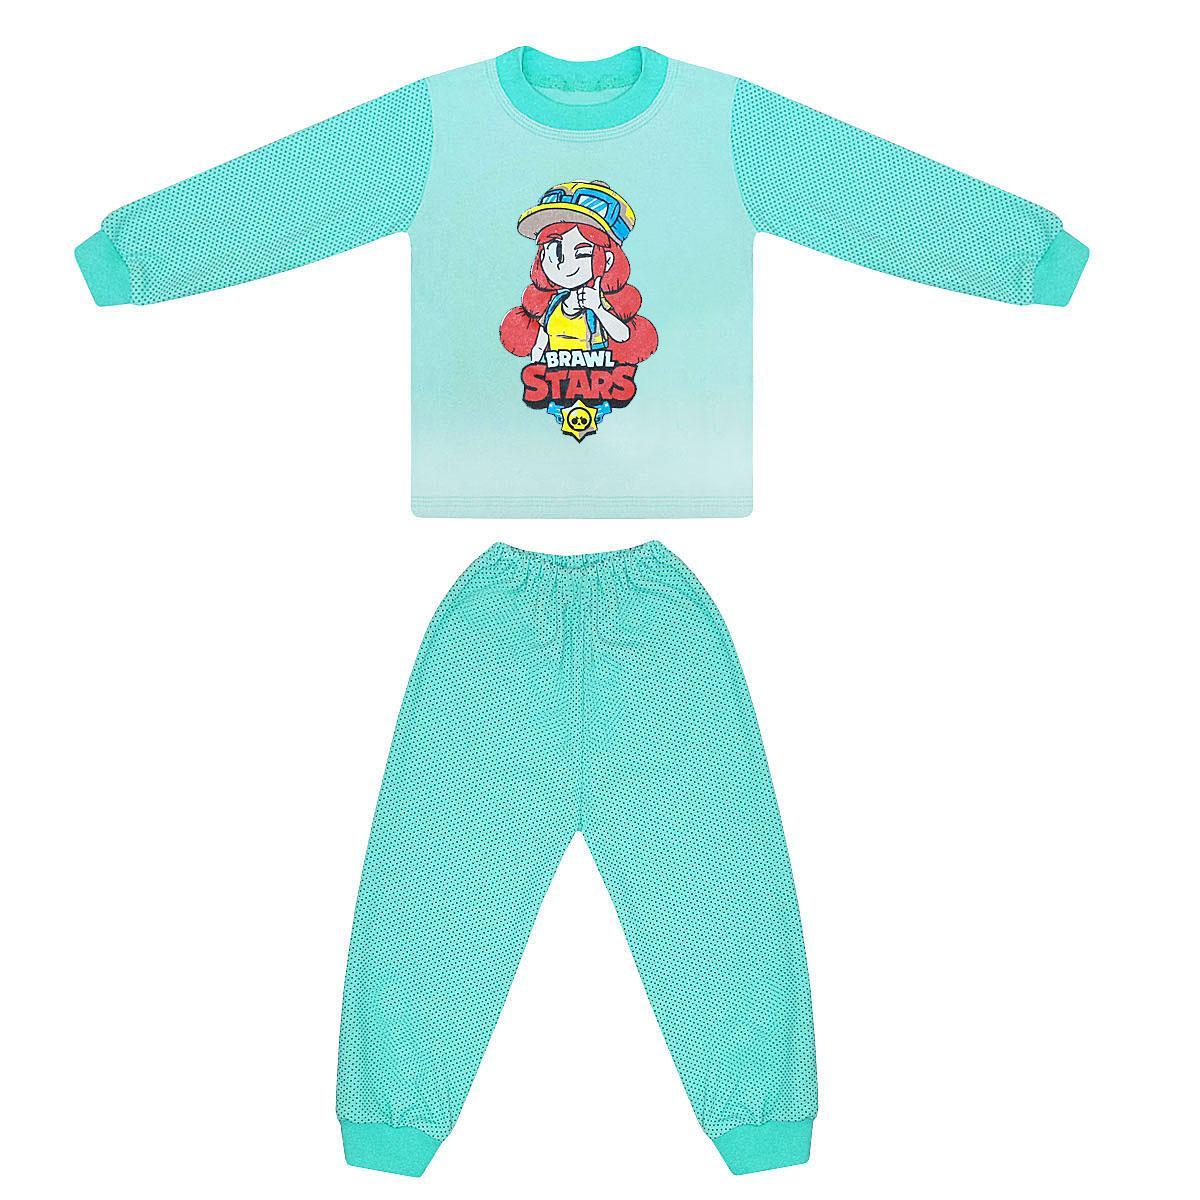 Детская пижама для девочки Brawl stars интерлок